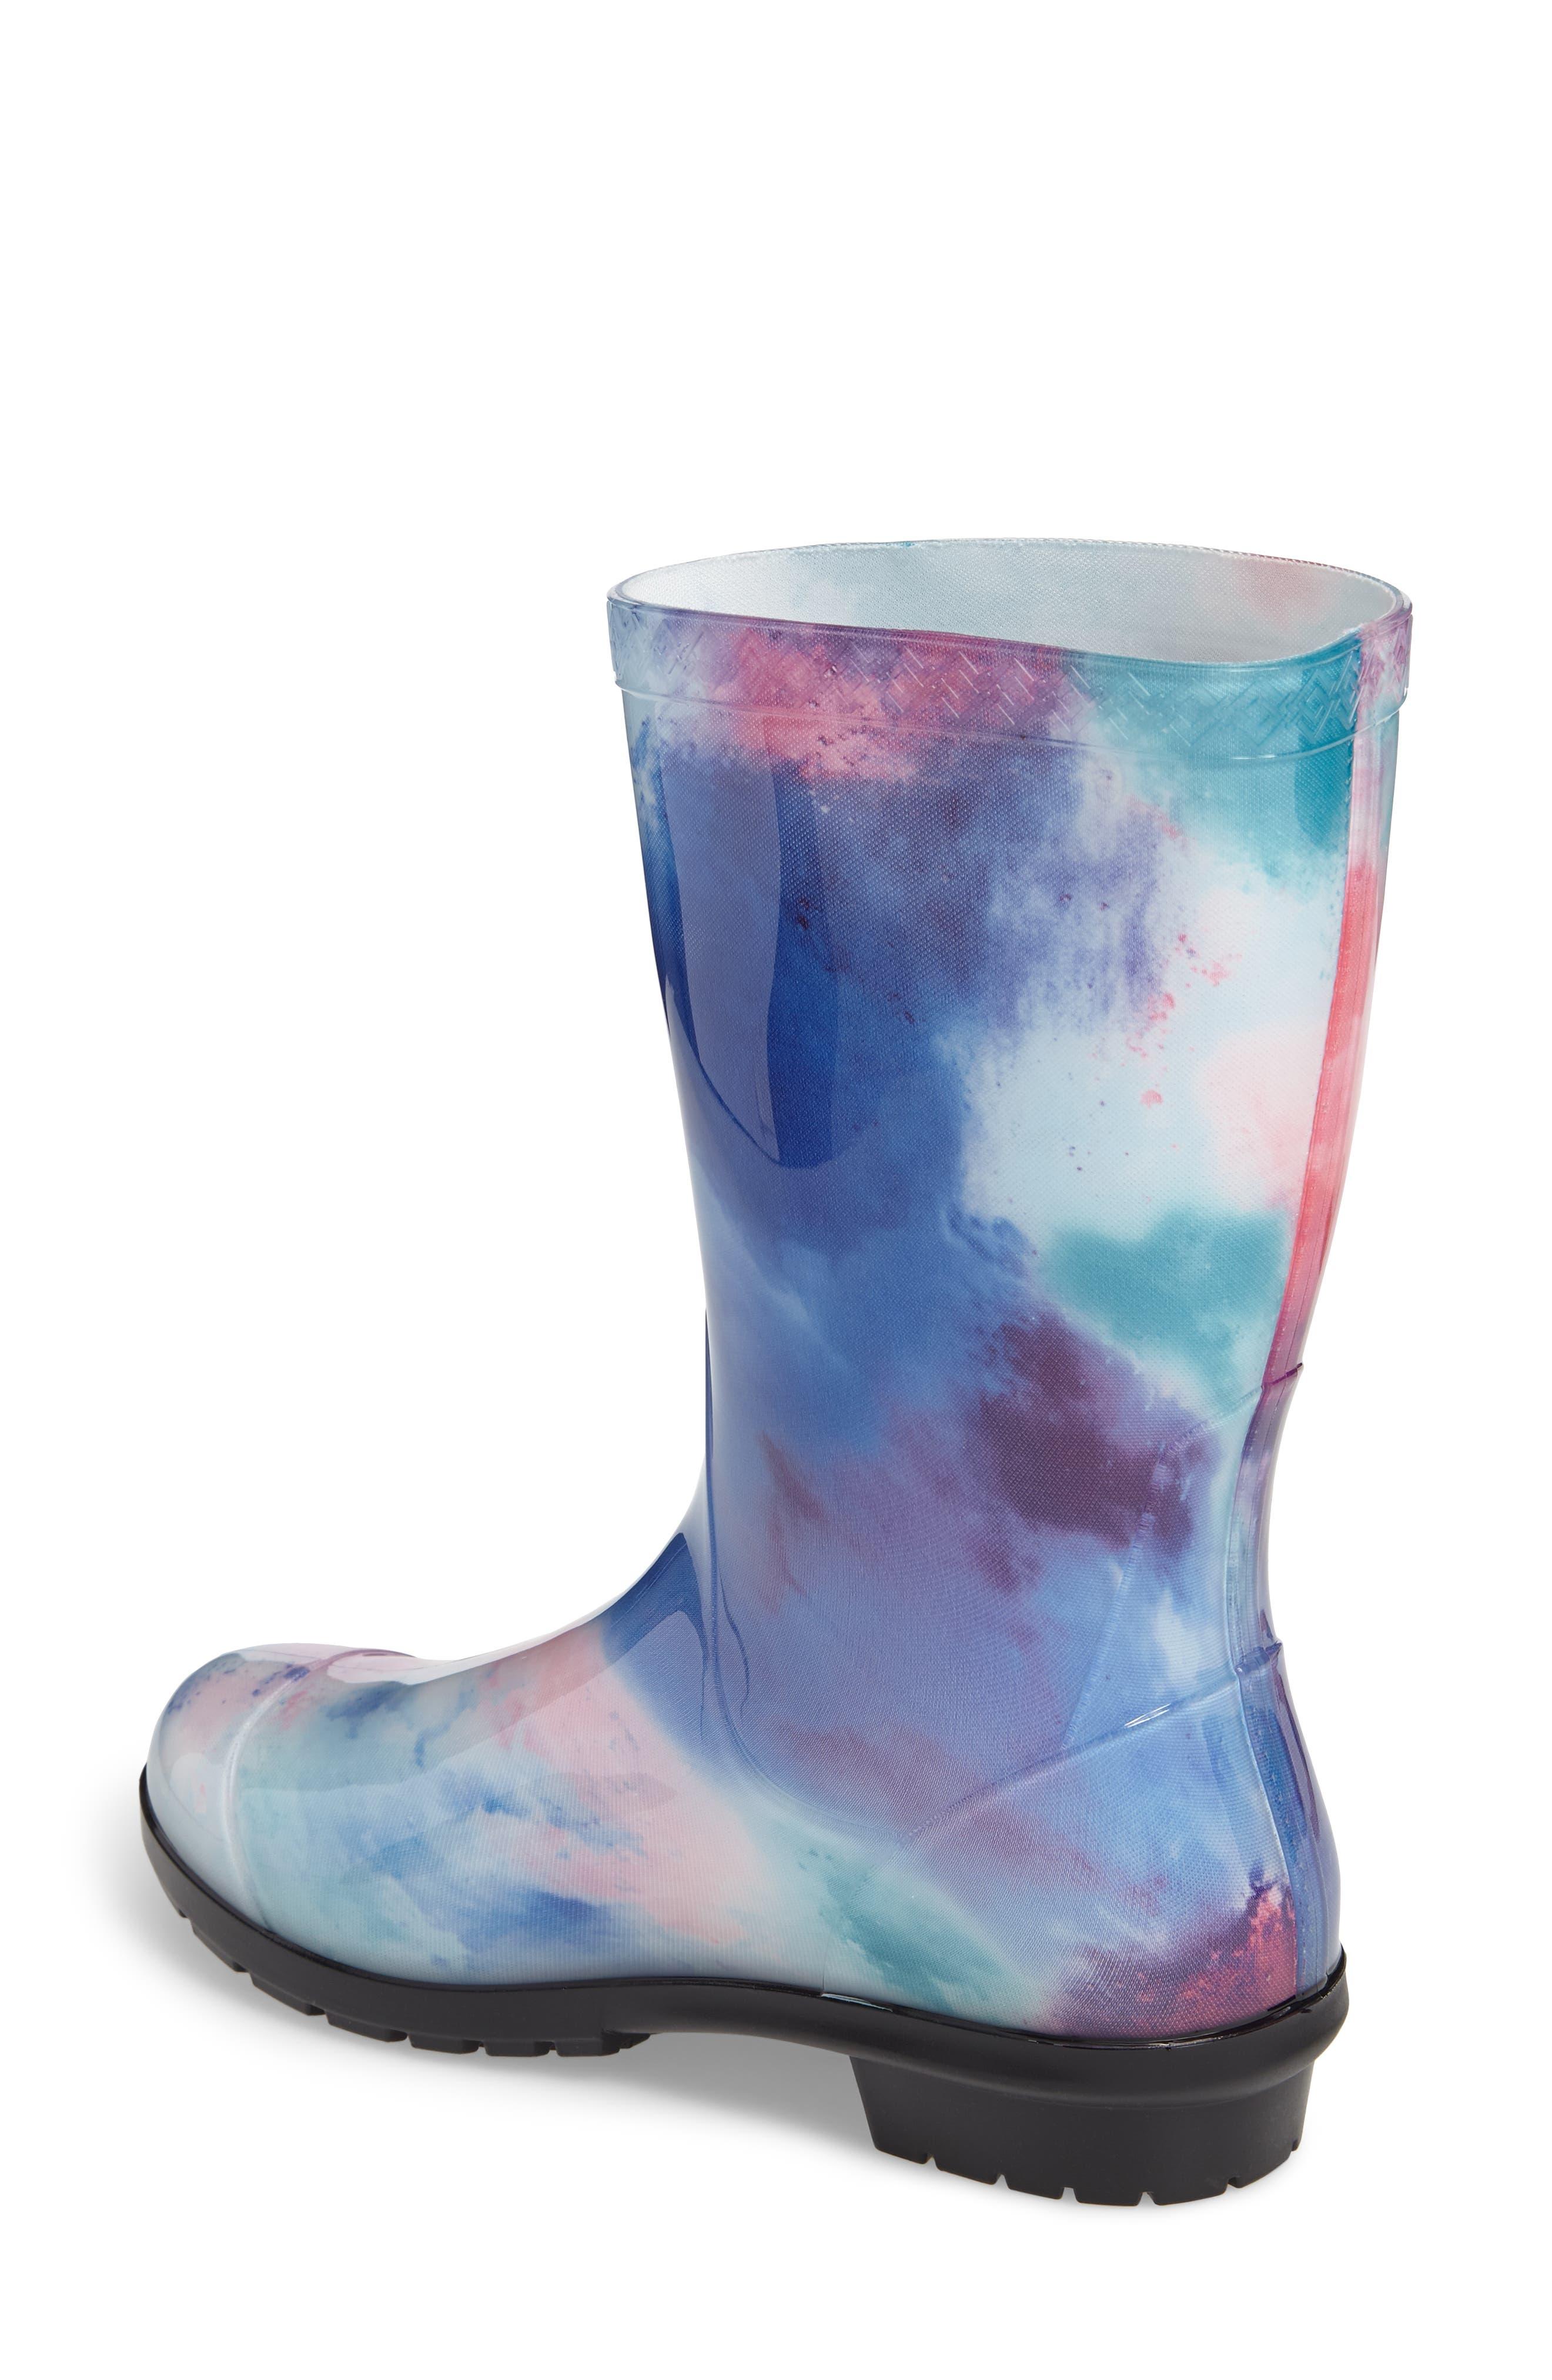 Sienna Watercolor Waterproof Rain Boot,                             Alternate thumbnail 2, color,                             Wild Rose/ Waterfall